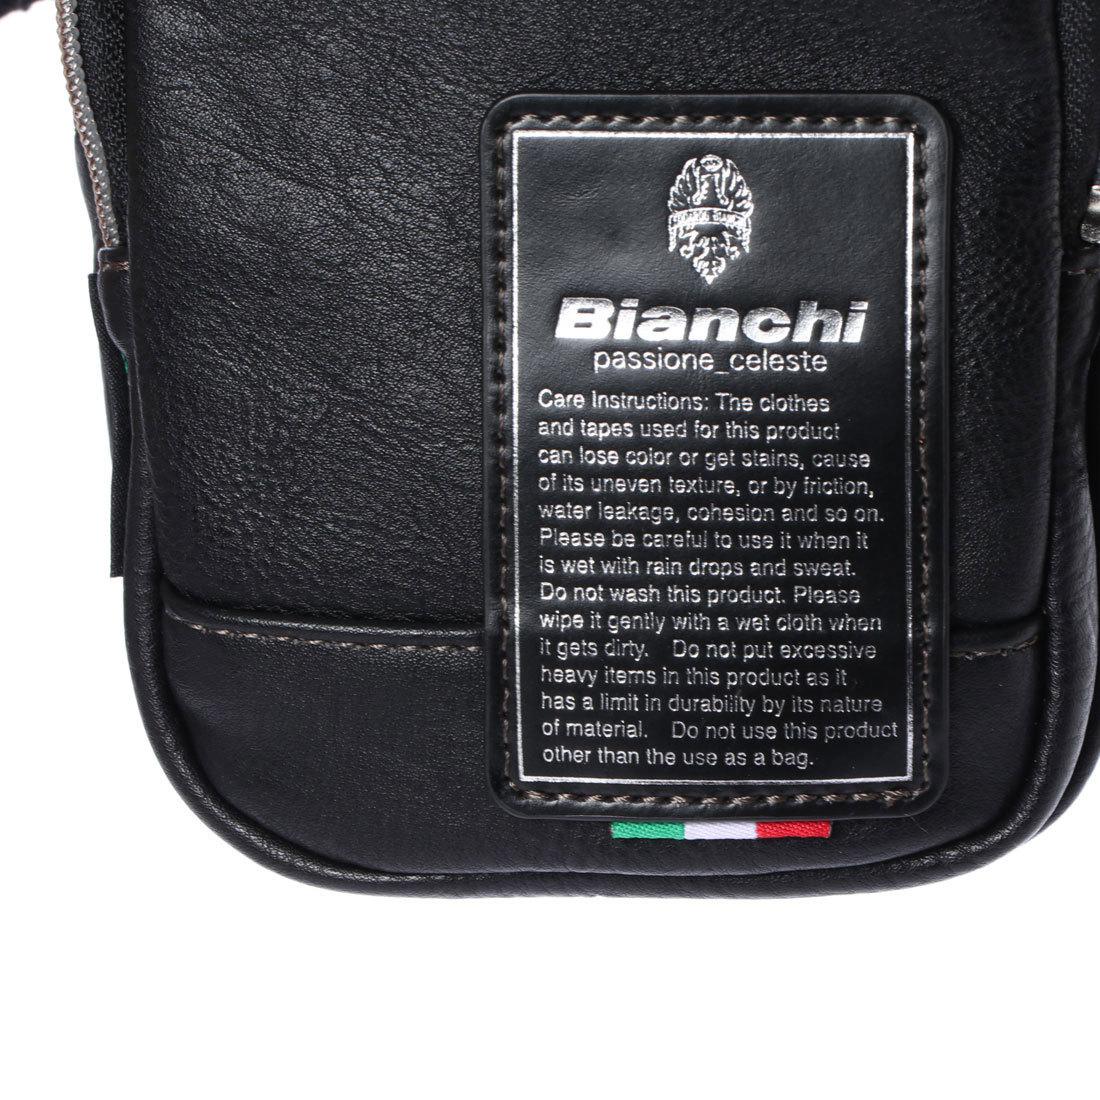 【Bianchi】ミニショルダーバッグ TBPI15